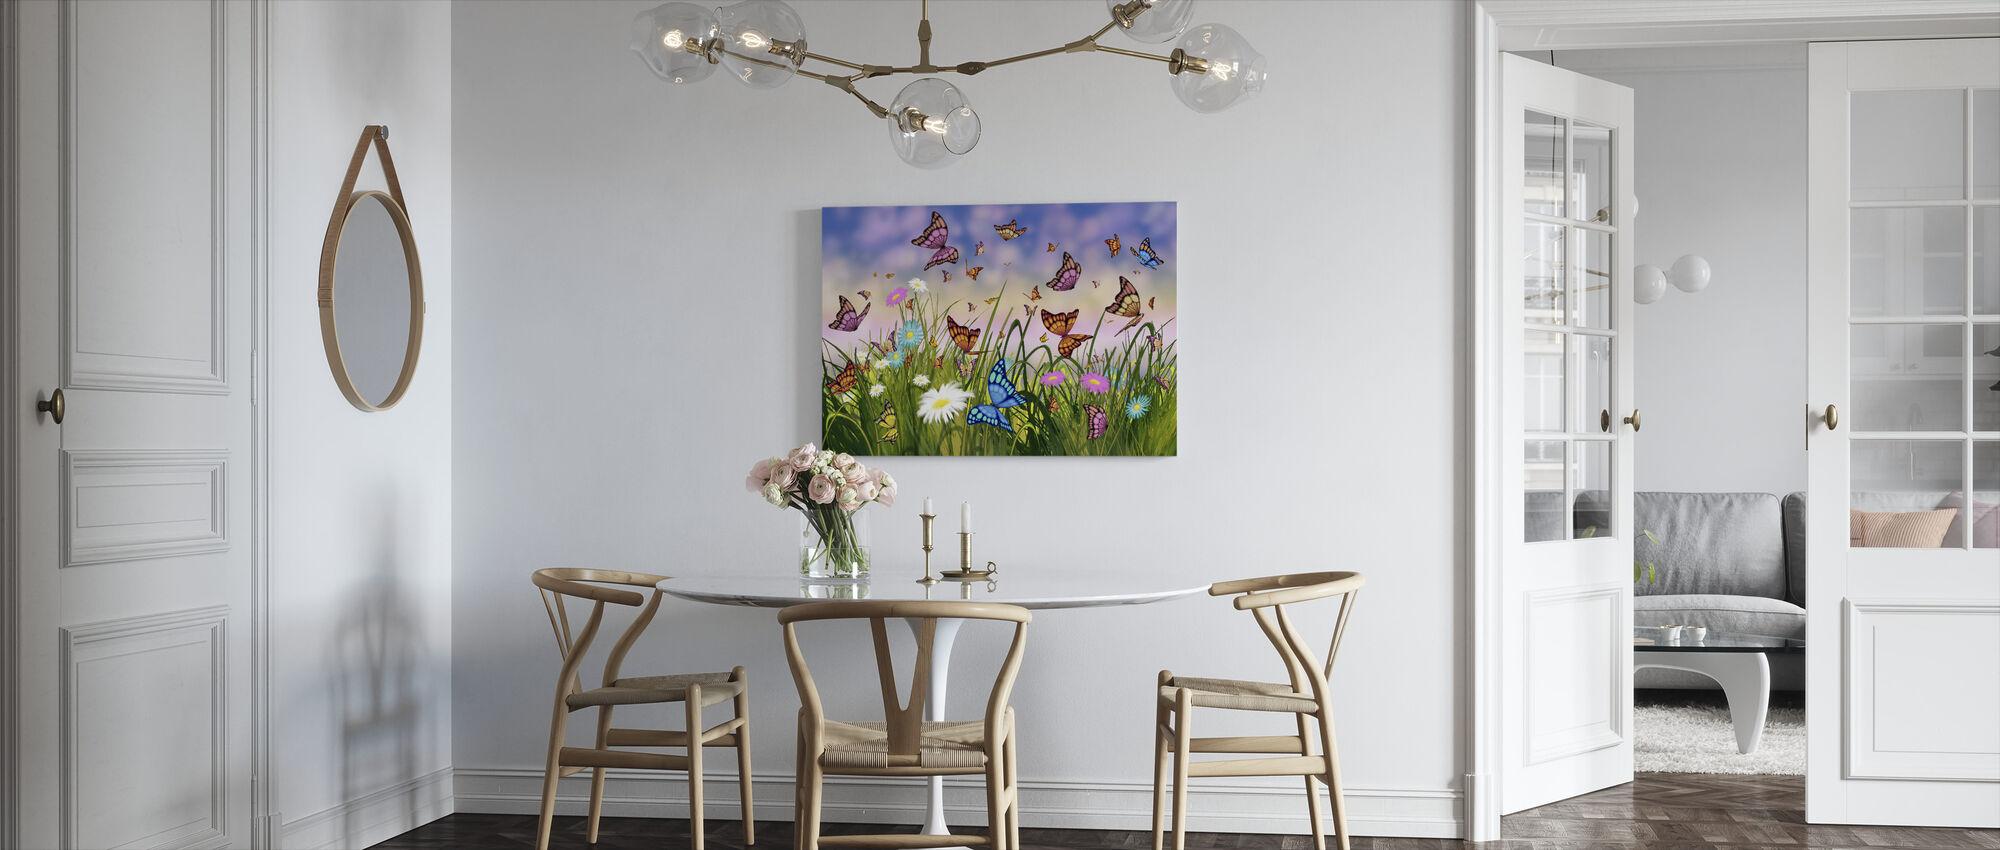 Vlinder Dromen - Canvas print - Keuken